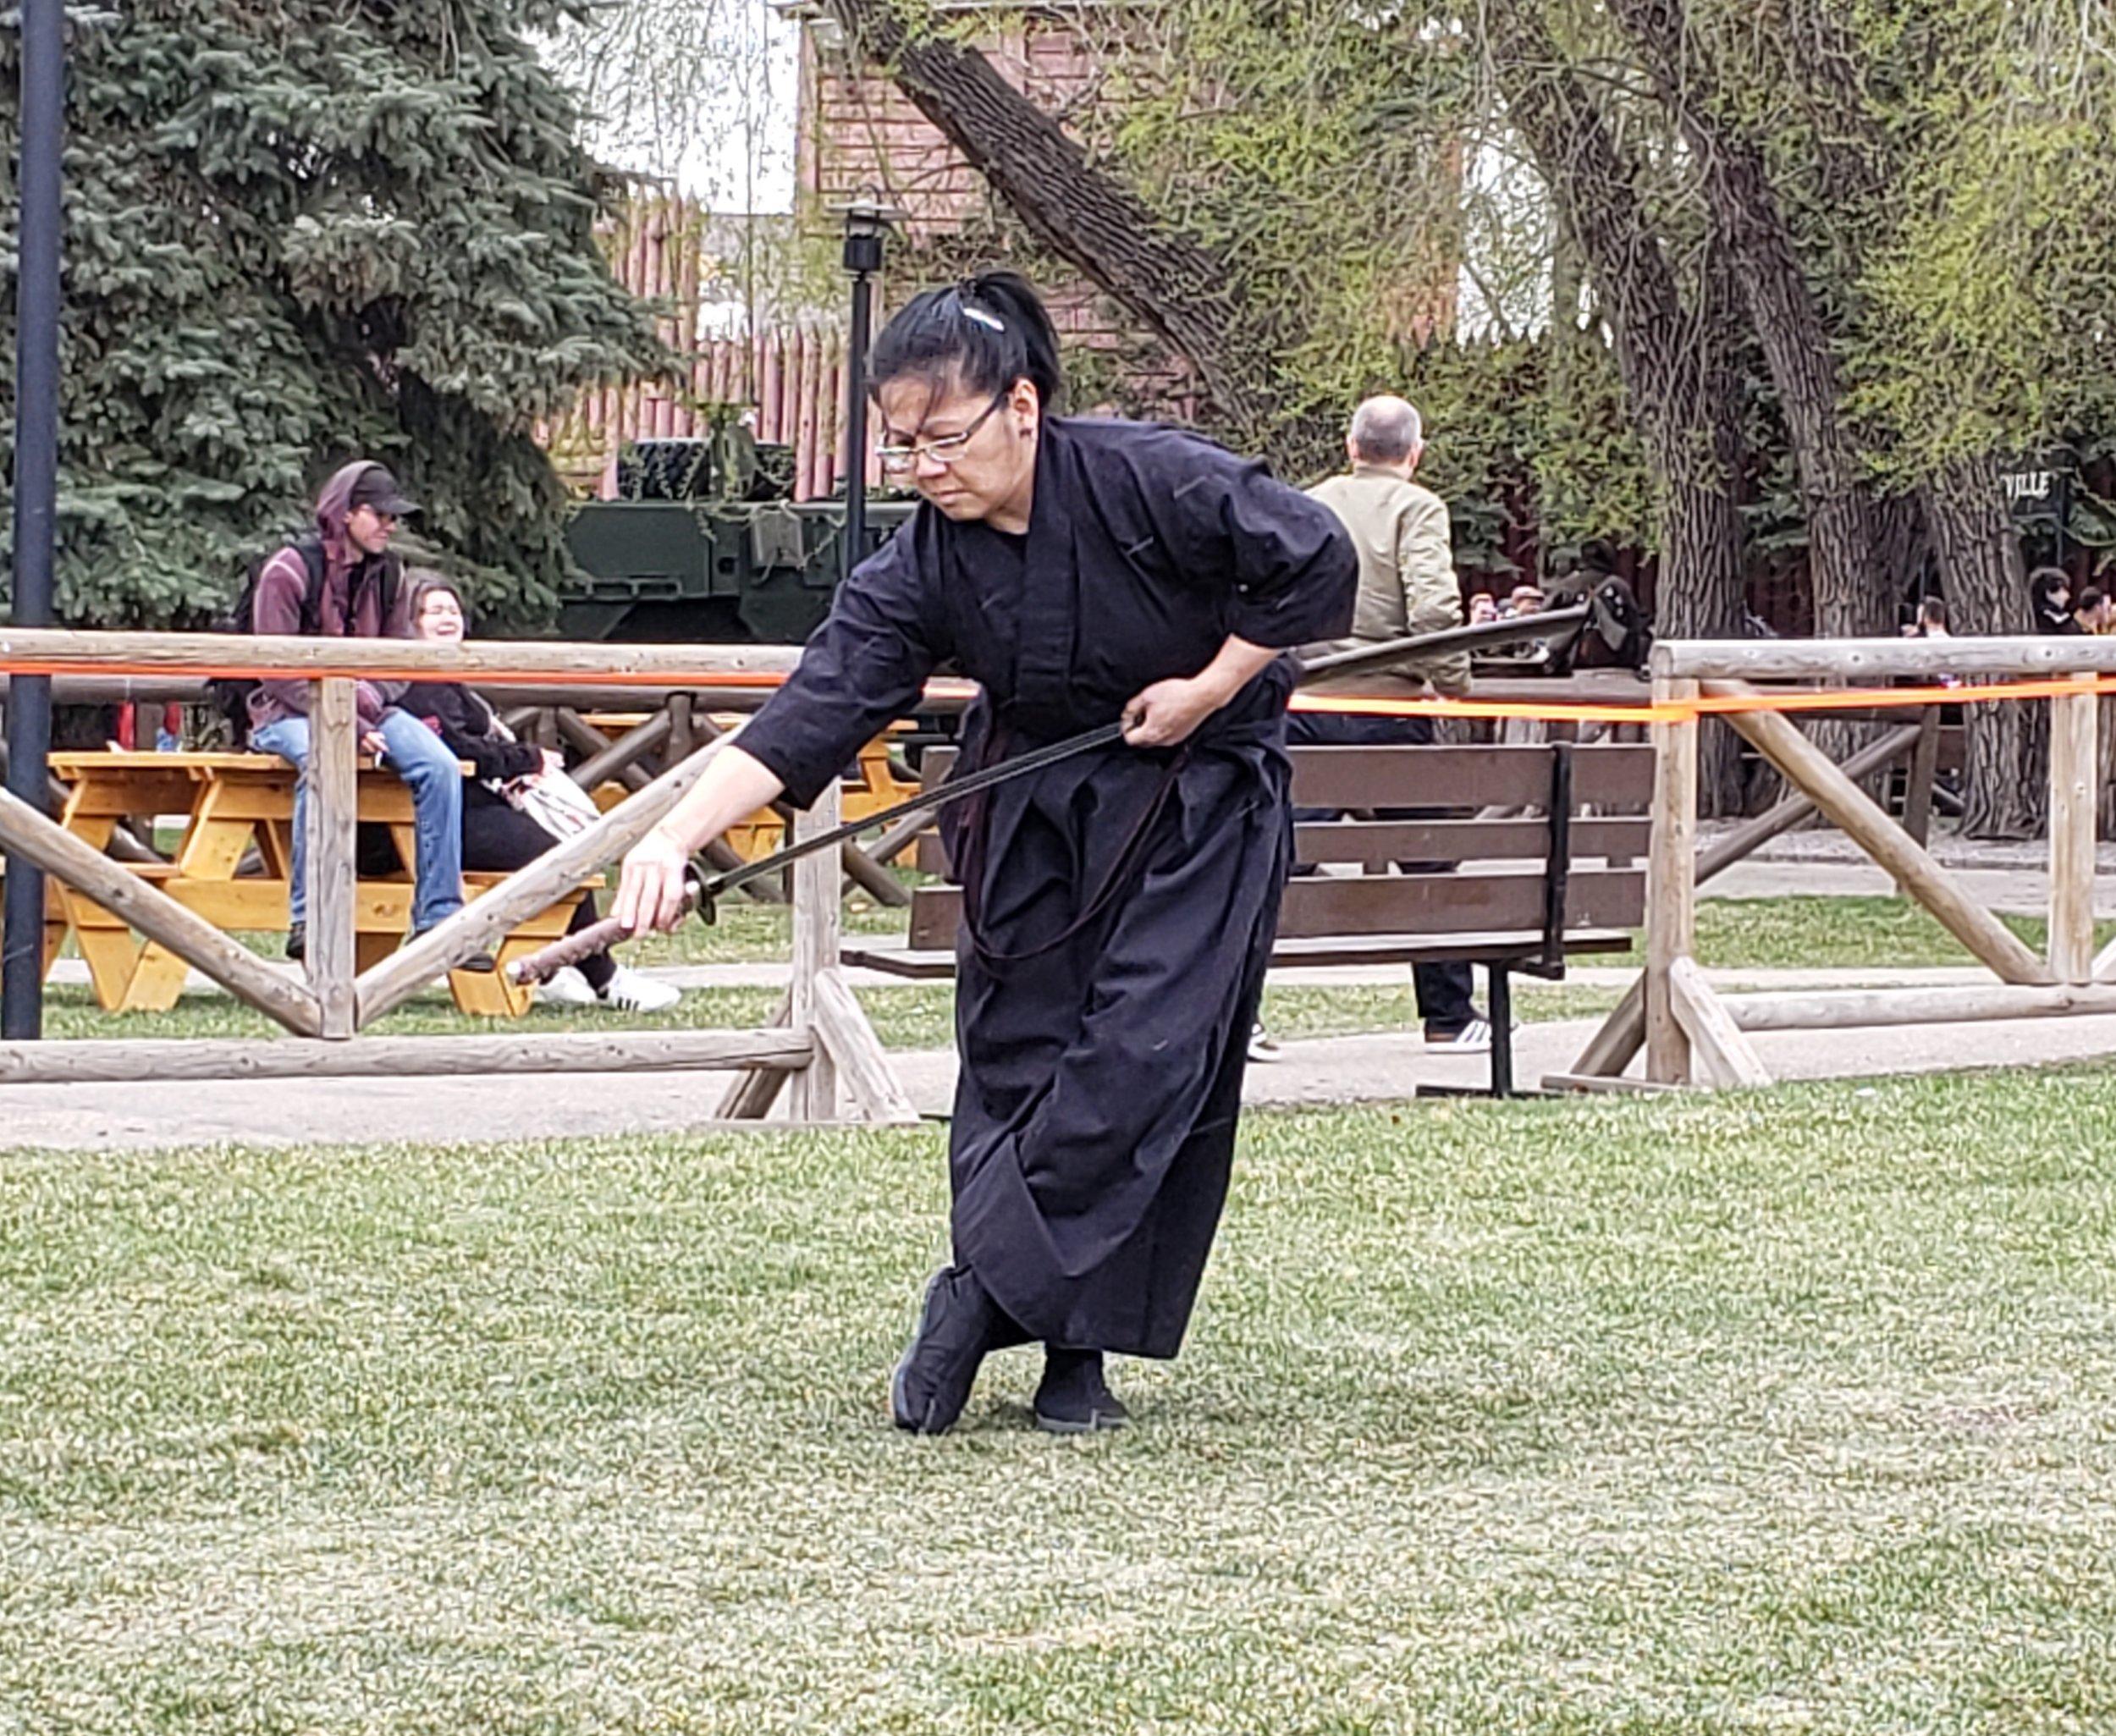 Demonstrating Ukigumo from the Chuden Iaido set (Muso Shinden Ryu) at the 2019 Calgary Expo. Funny thing is, I was supposed to demonstrate Yamaoroshi, but hey - kigurai. Photo credit: Jonathon Wilkes.